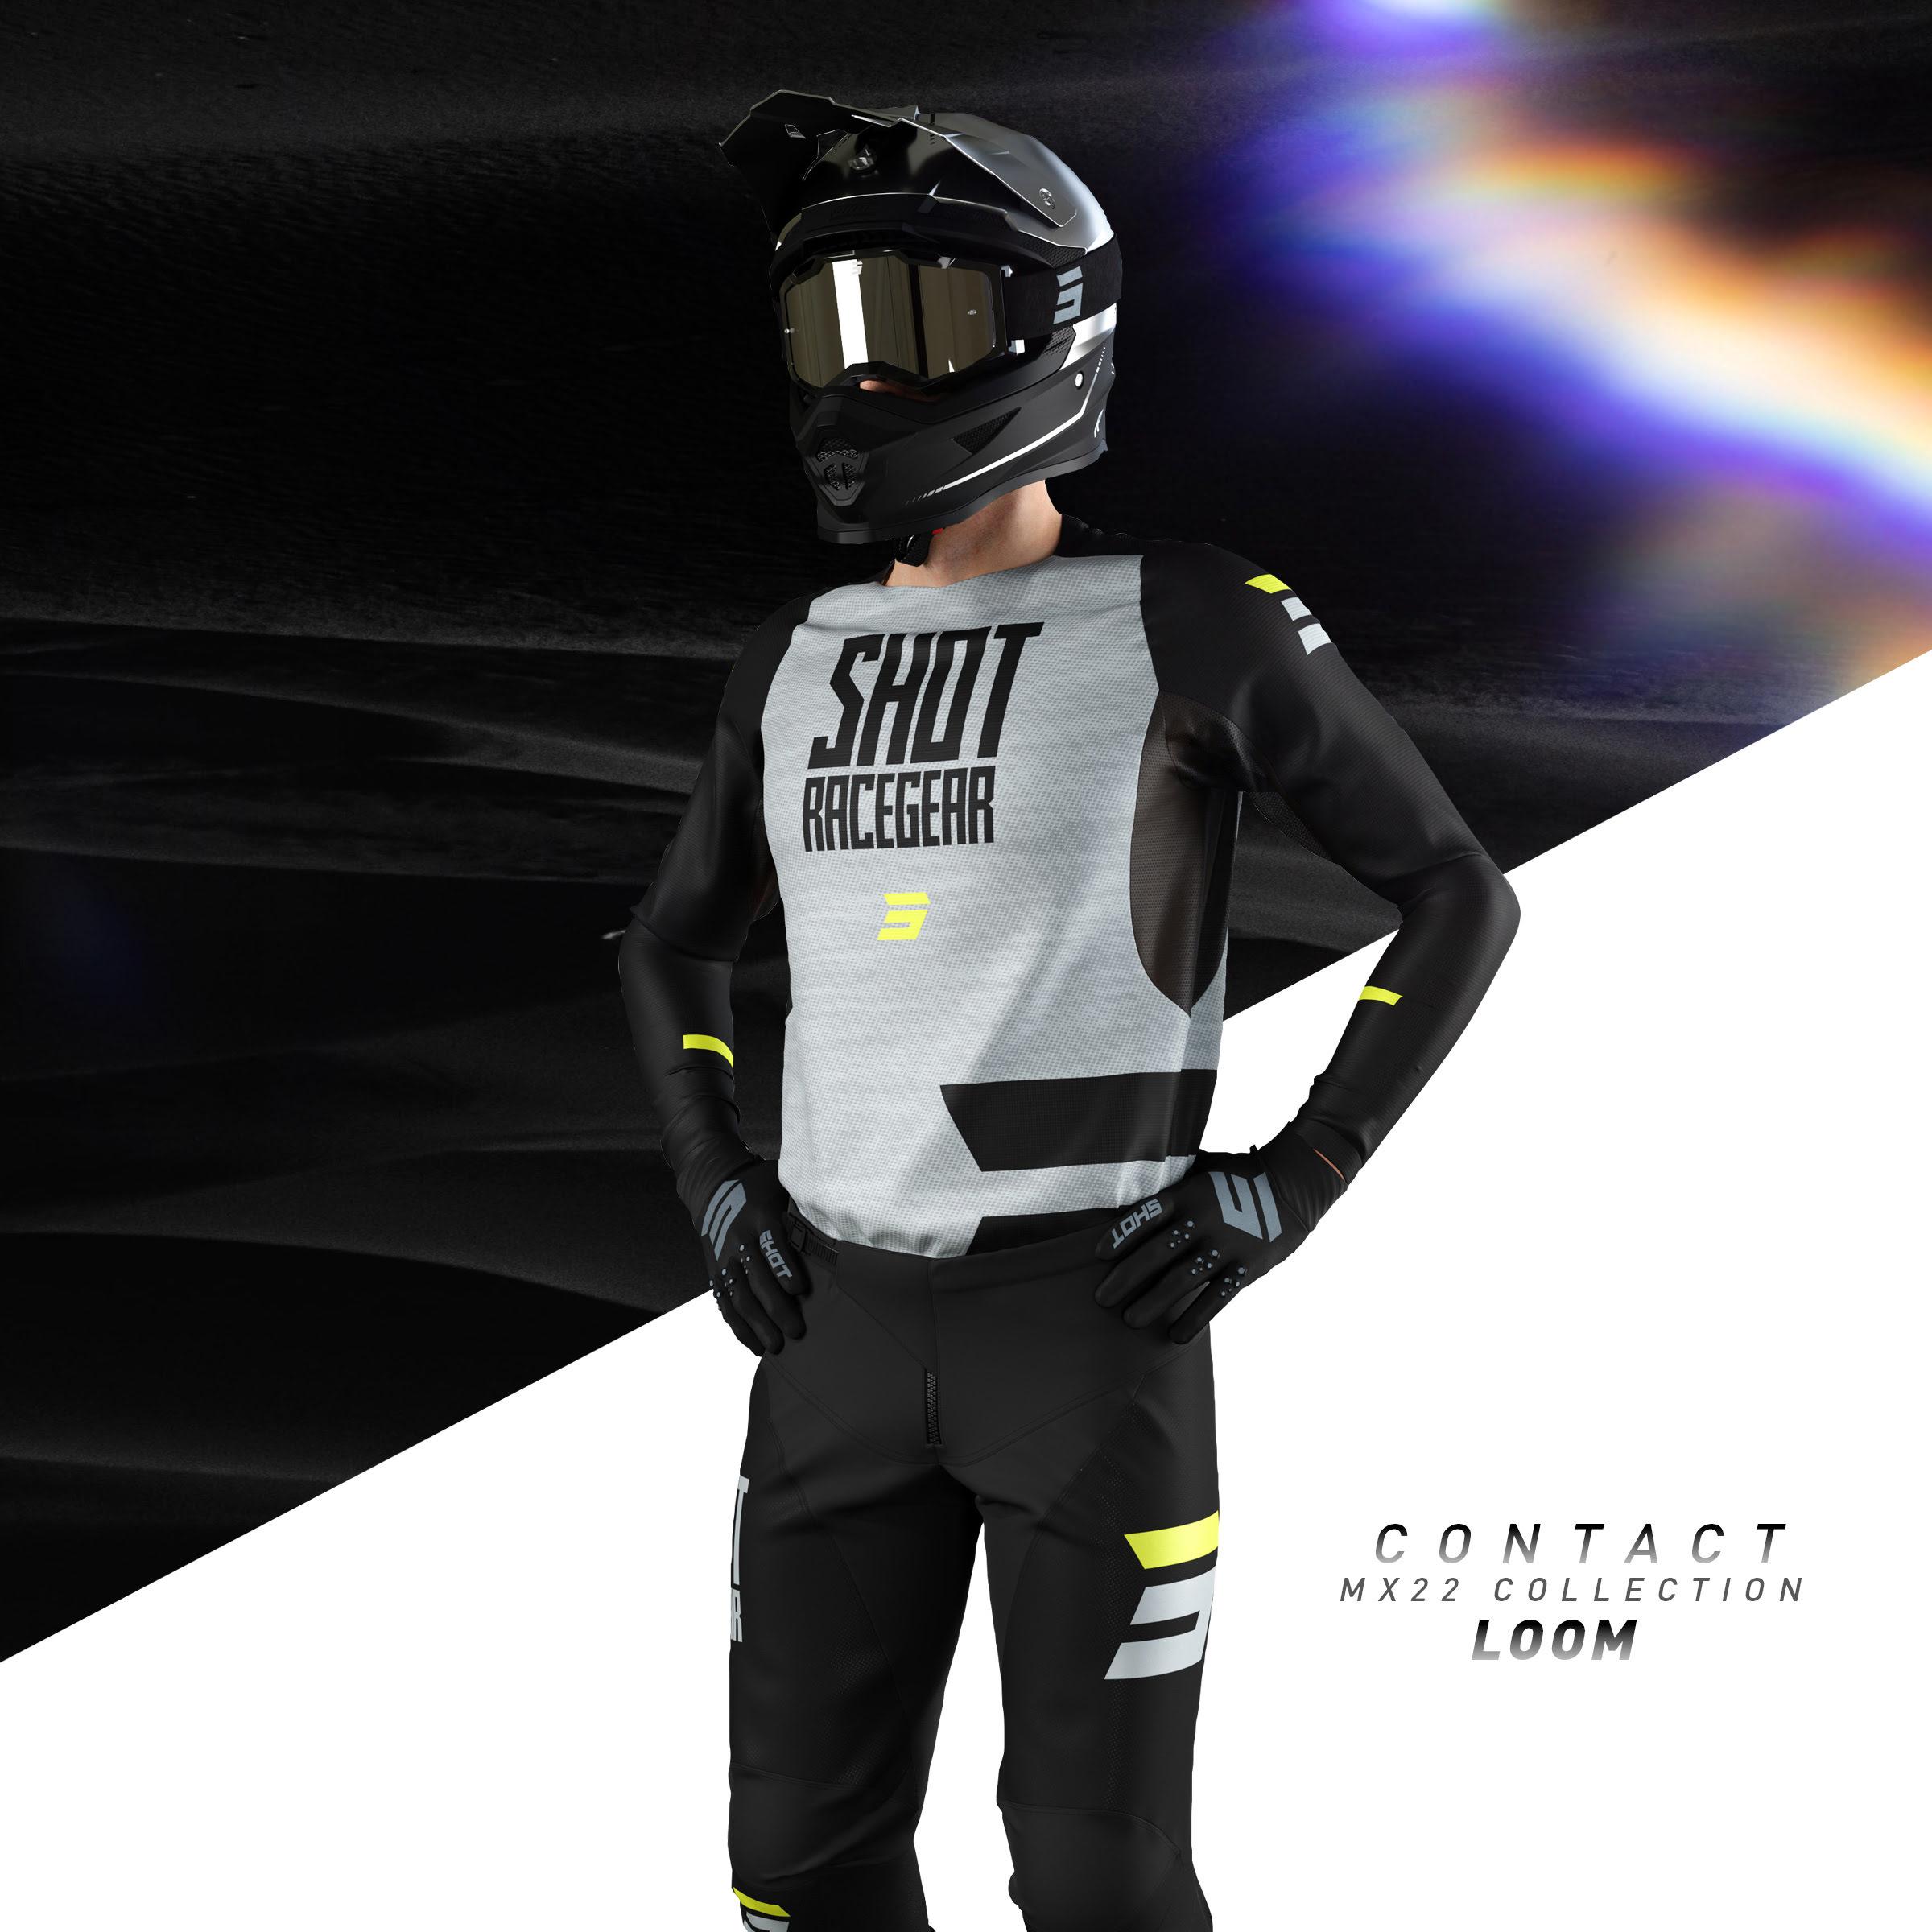 SHOT 2022 - Contact Loom